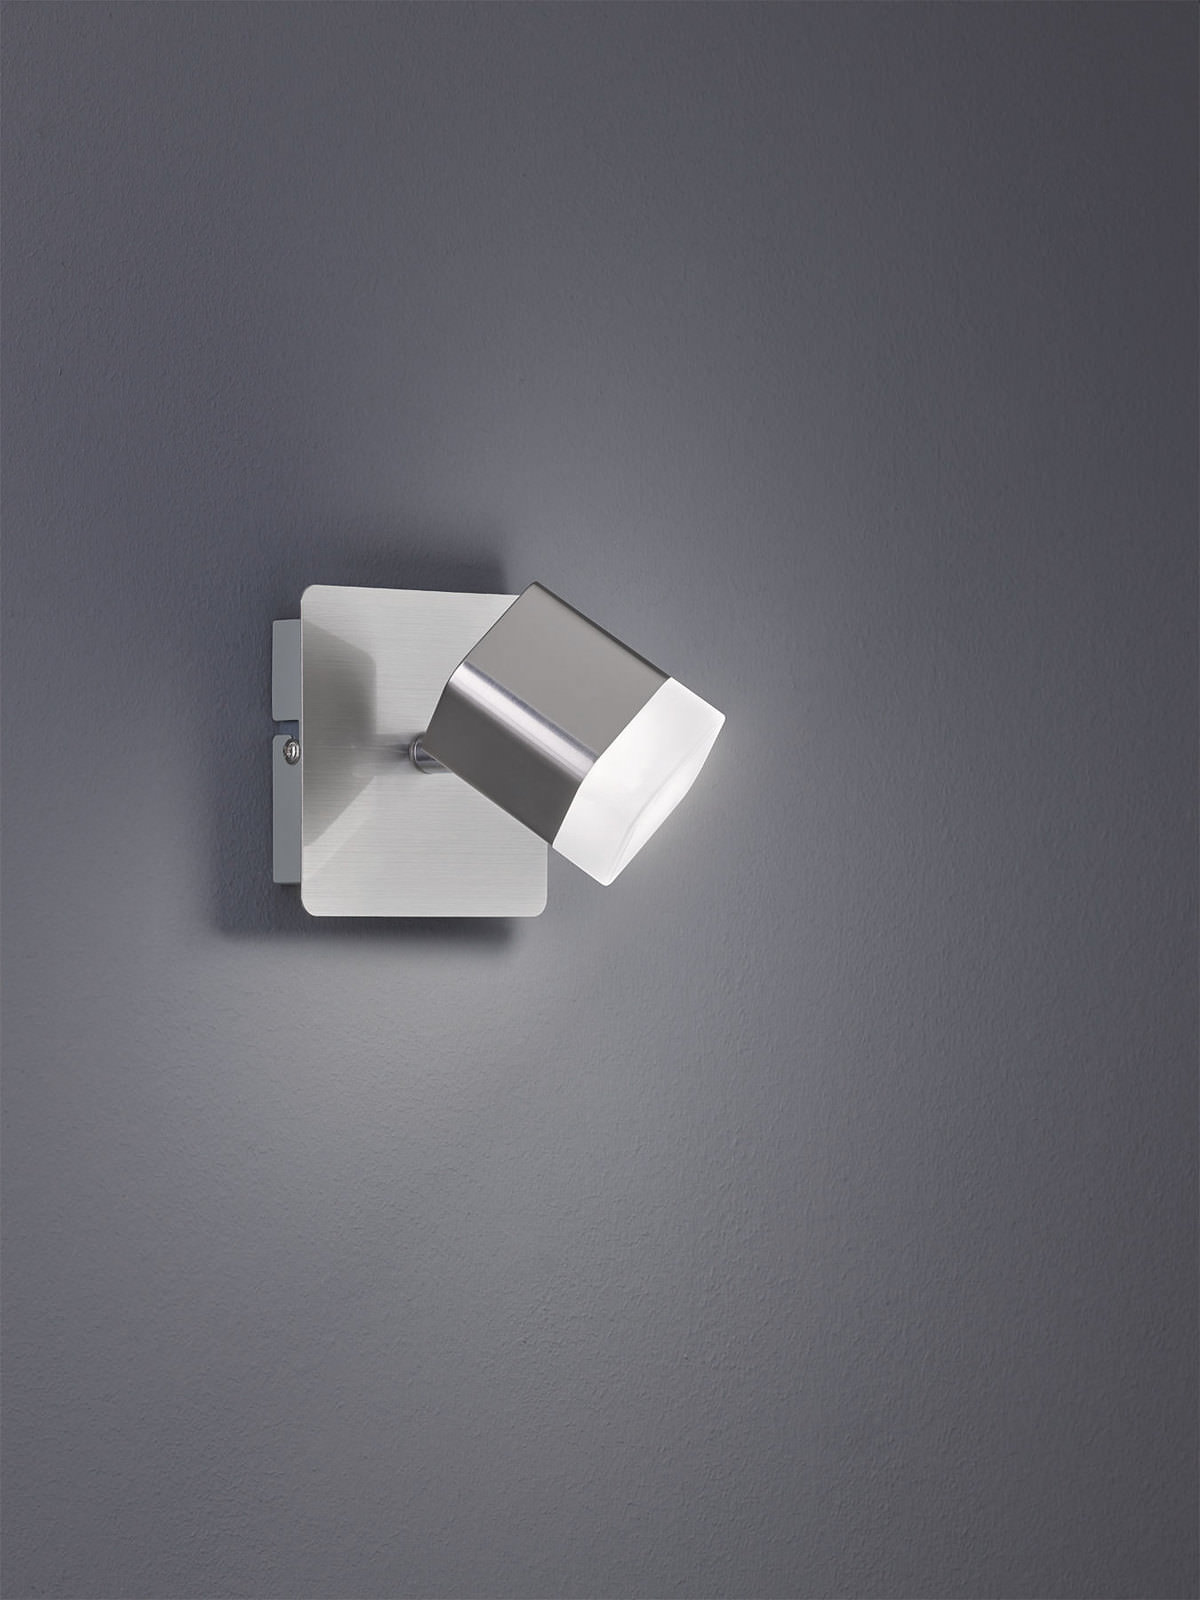 reality leuchten led spot 1flg online entdecken knuffmann ihr m belhaus. Black Bedroom Furniture Sets. Home Design Ideas